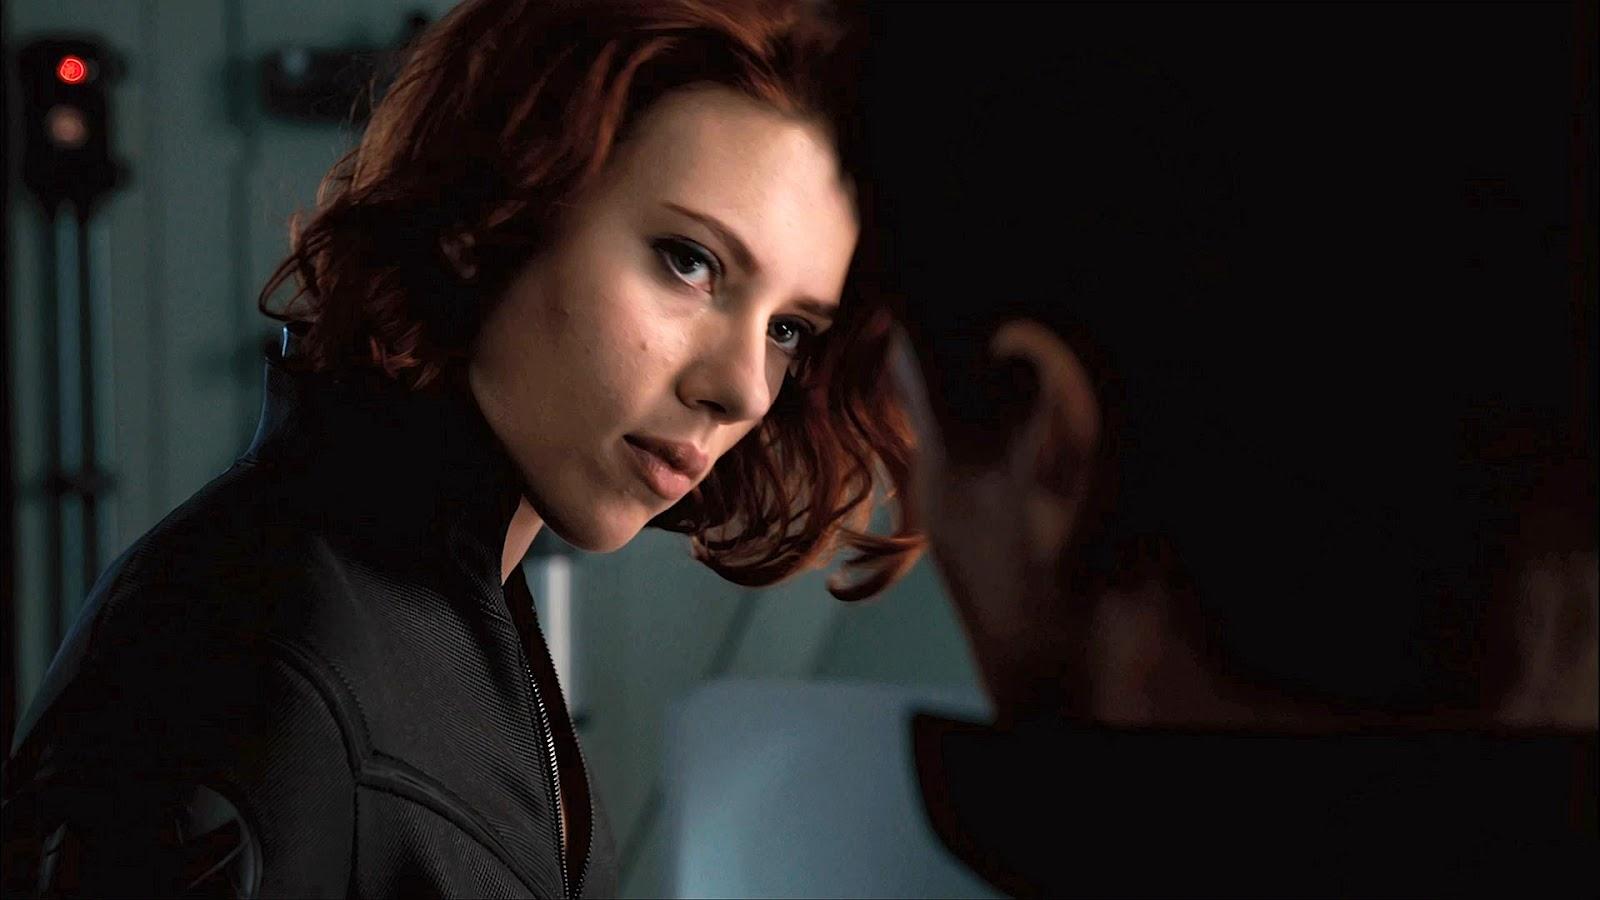 http://4.bp.blogspot.com/-8_gXLWqcsxc/T5xbWqjhFyI/AAAAAAAABkE/rF13EoYUFeM/s1600/Scarlett_Johansson_Avengers.jpg